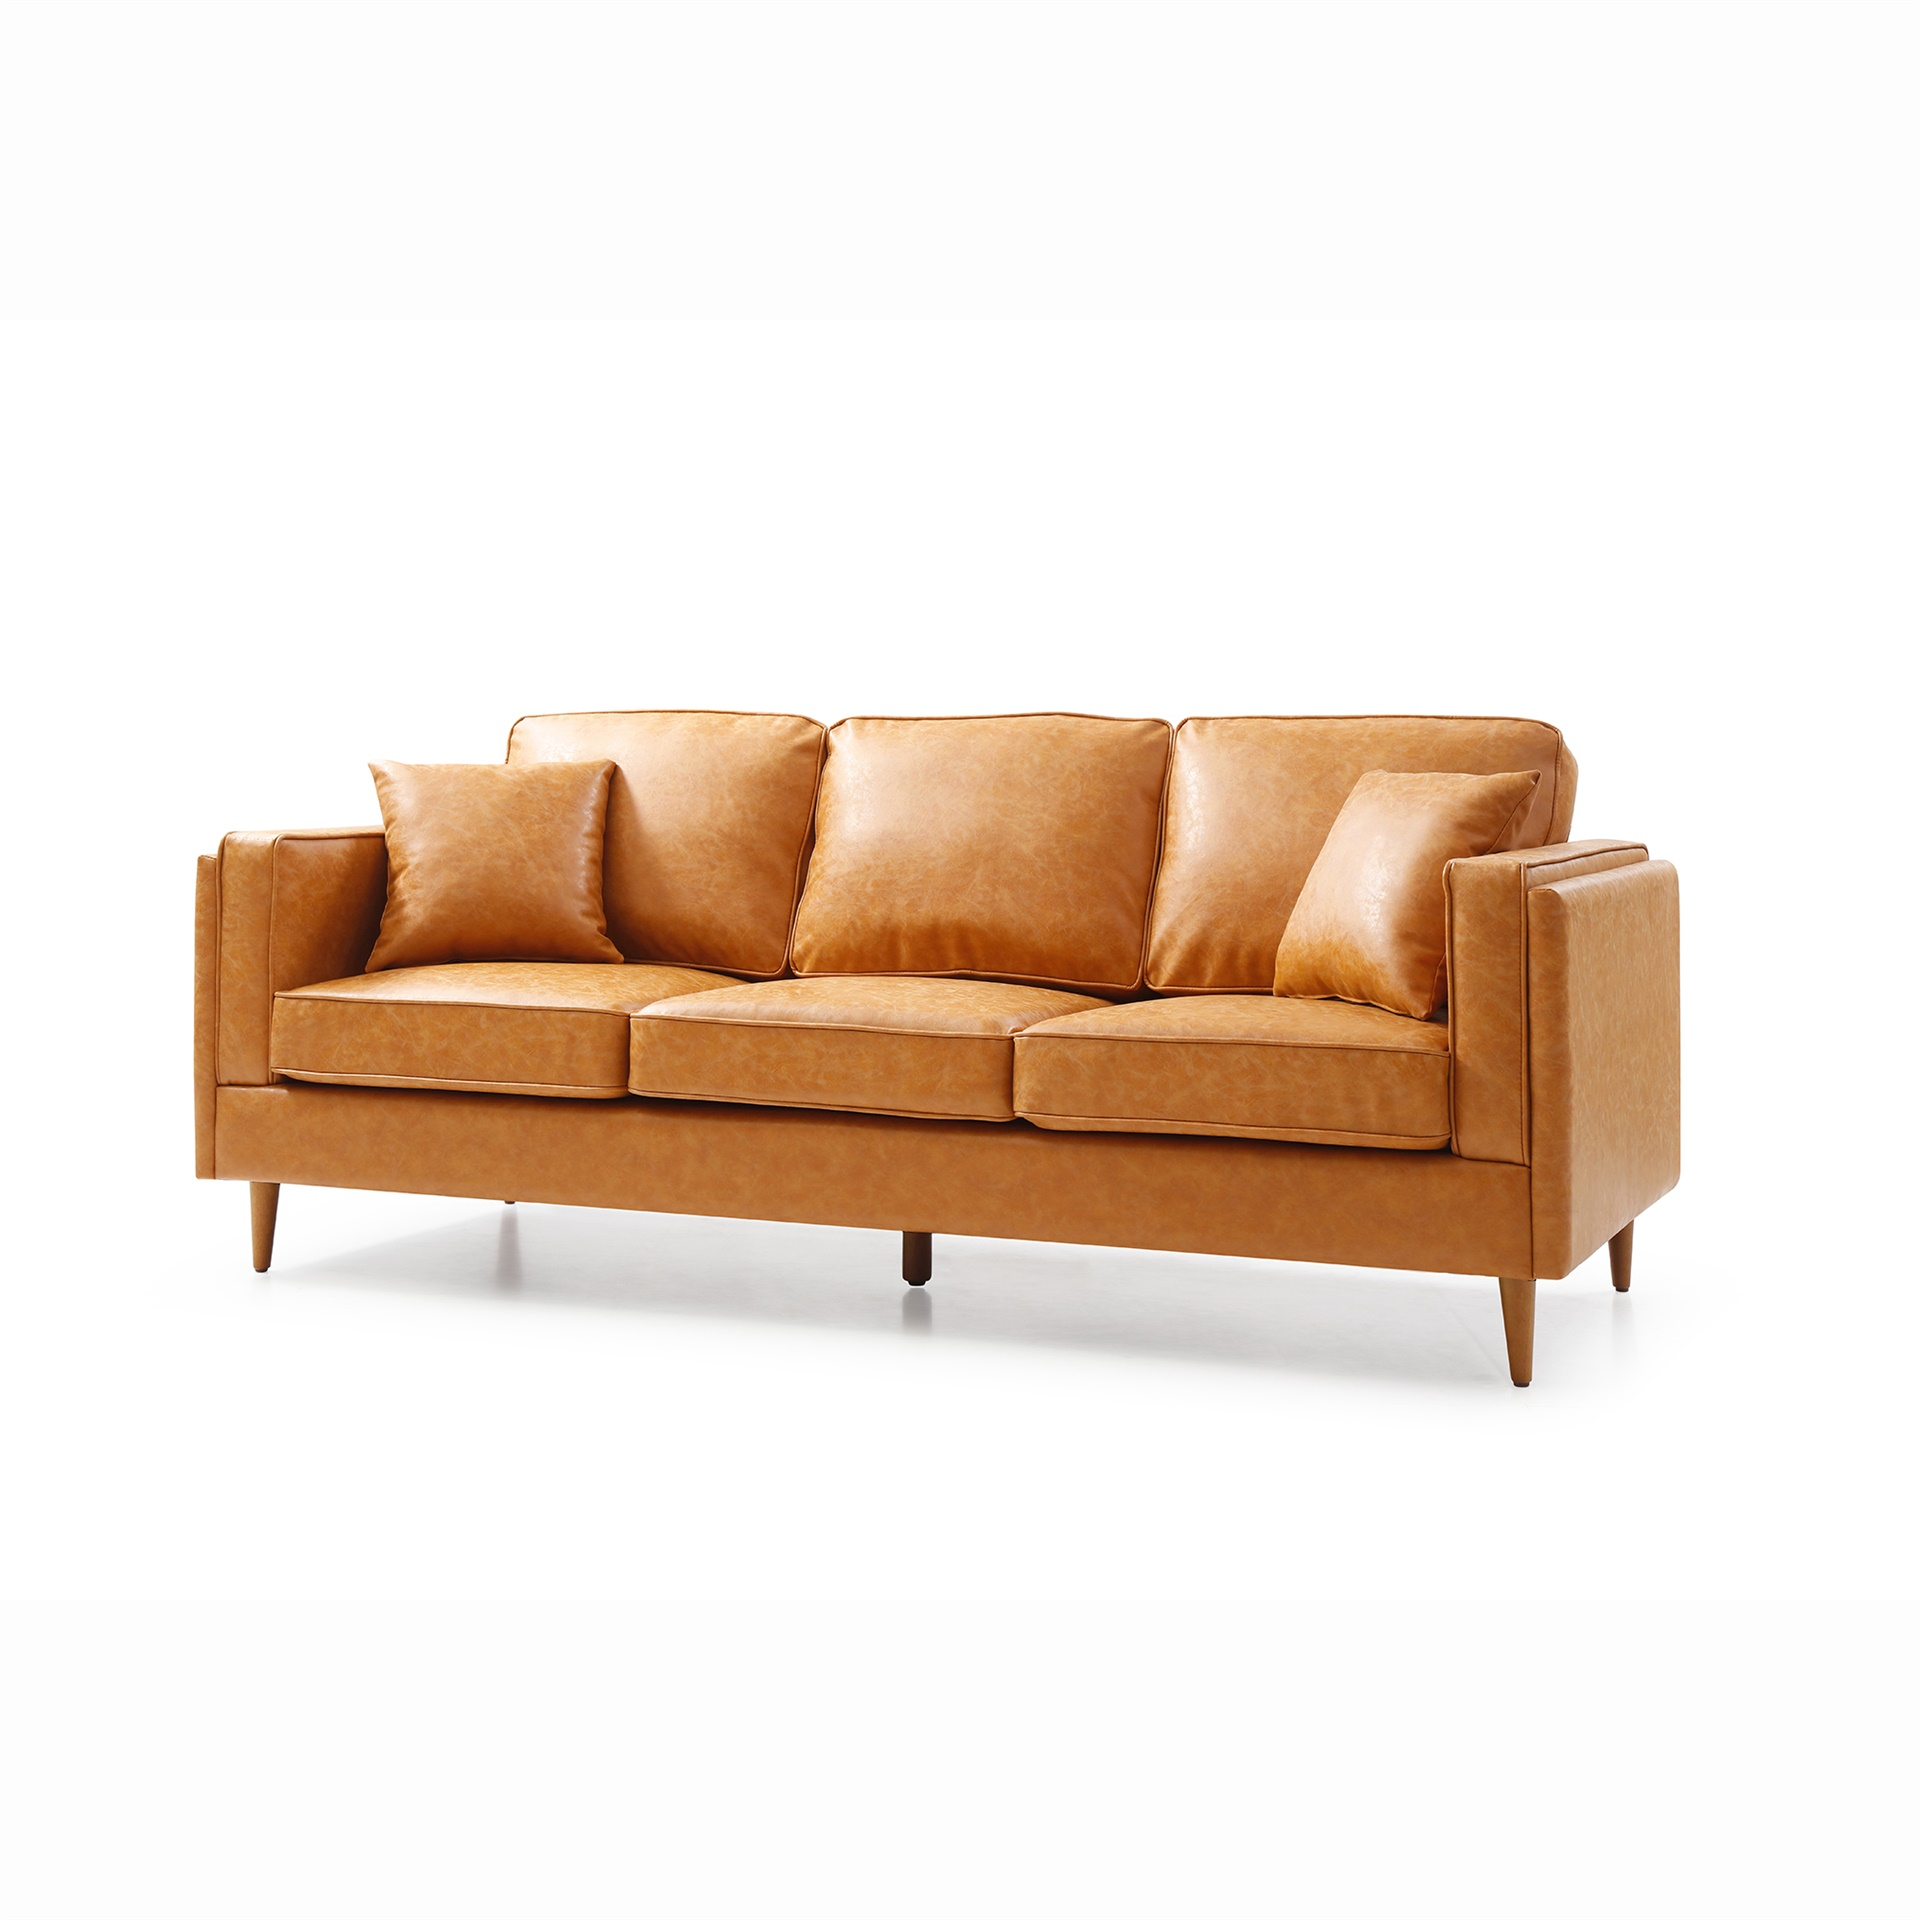 Miraculous Greyson Sofa Machost Co Dining Chair Design Ideas Machostcouk